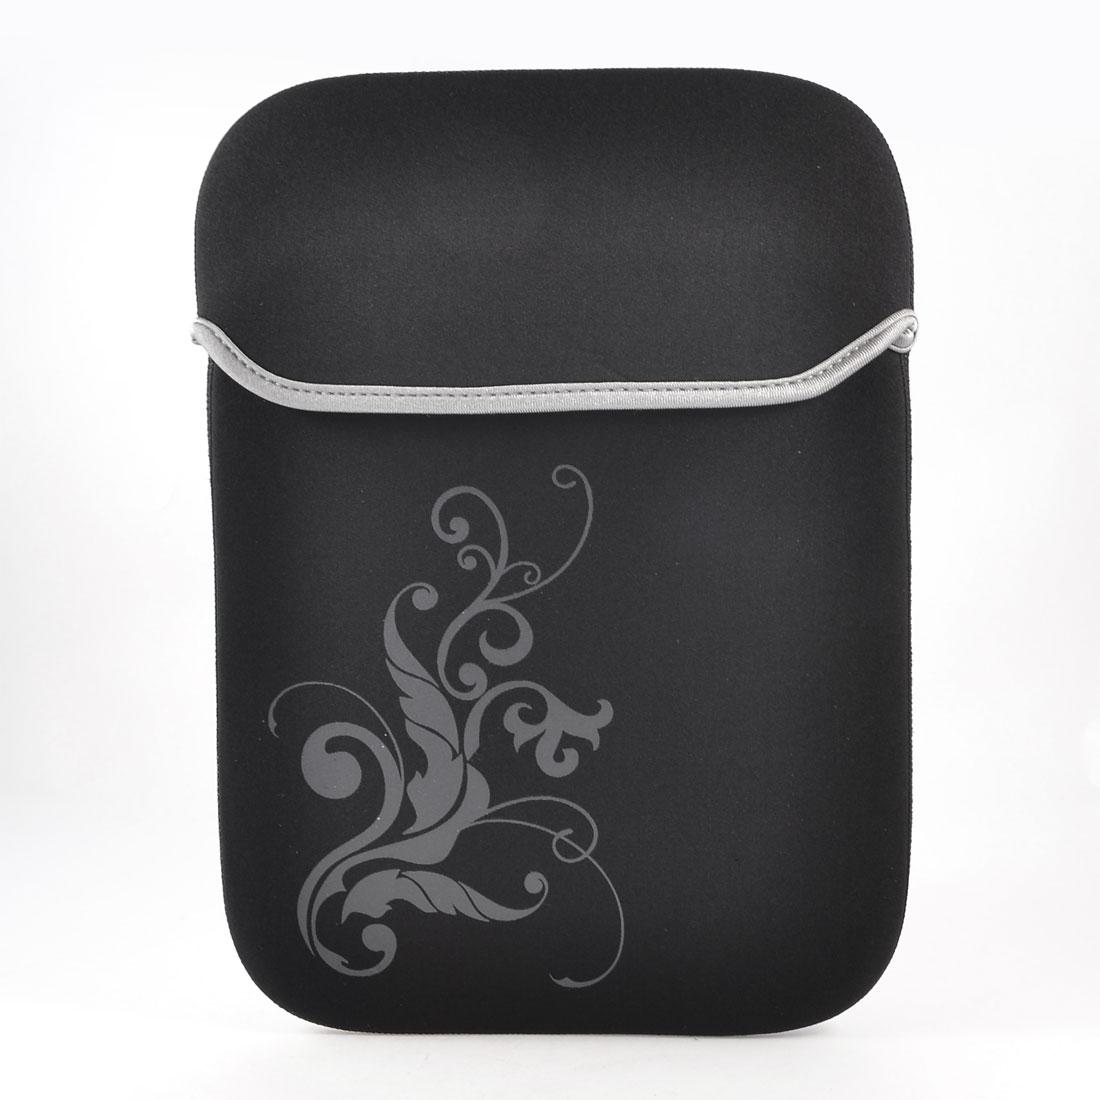 "10"" 10.1"" Tablet Laptop Flower Pattern Black Neoprene Sleeve Bag Case Pouch"